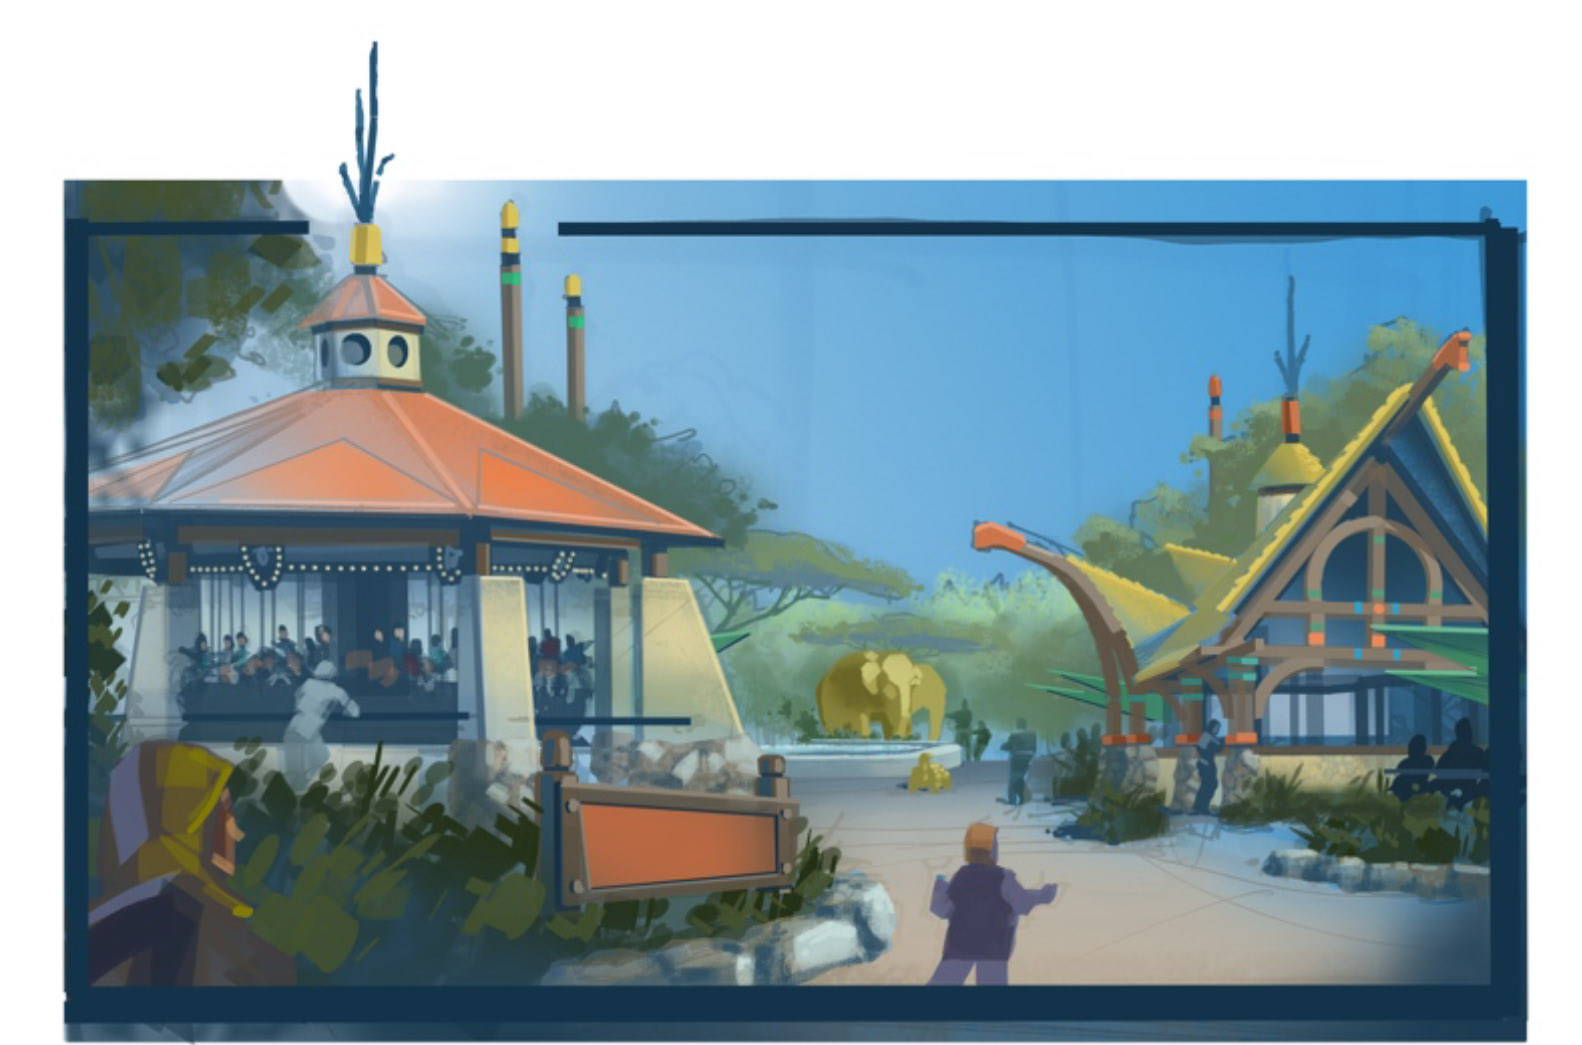 LA Zoo Carousel Plaza - Wyatt Design Group